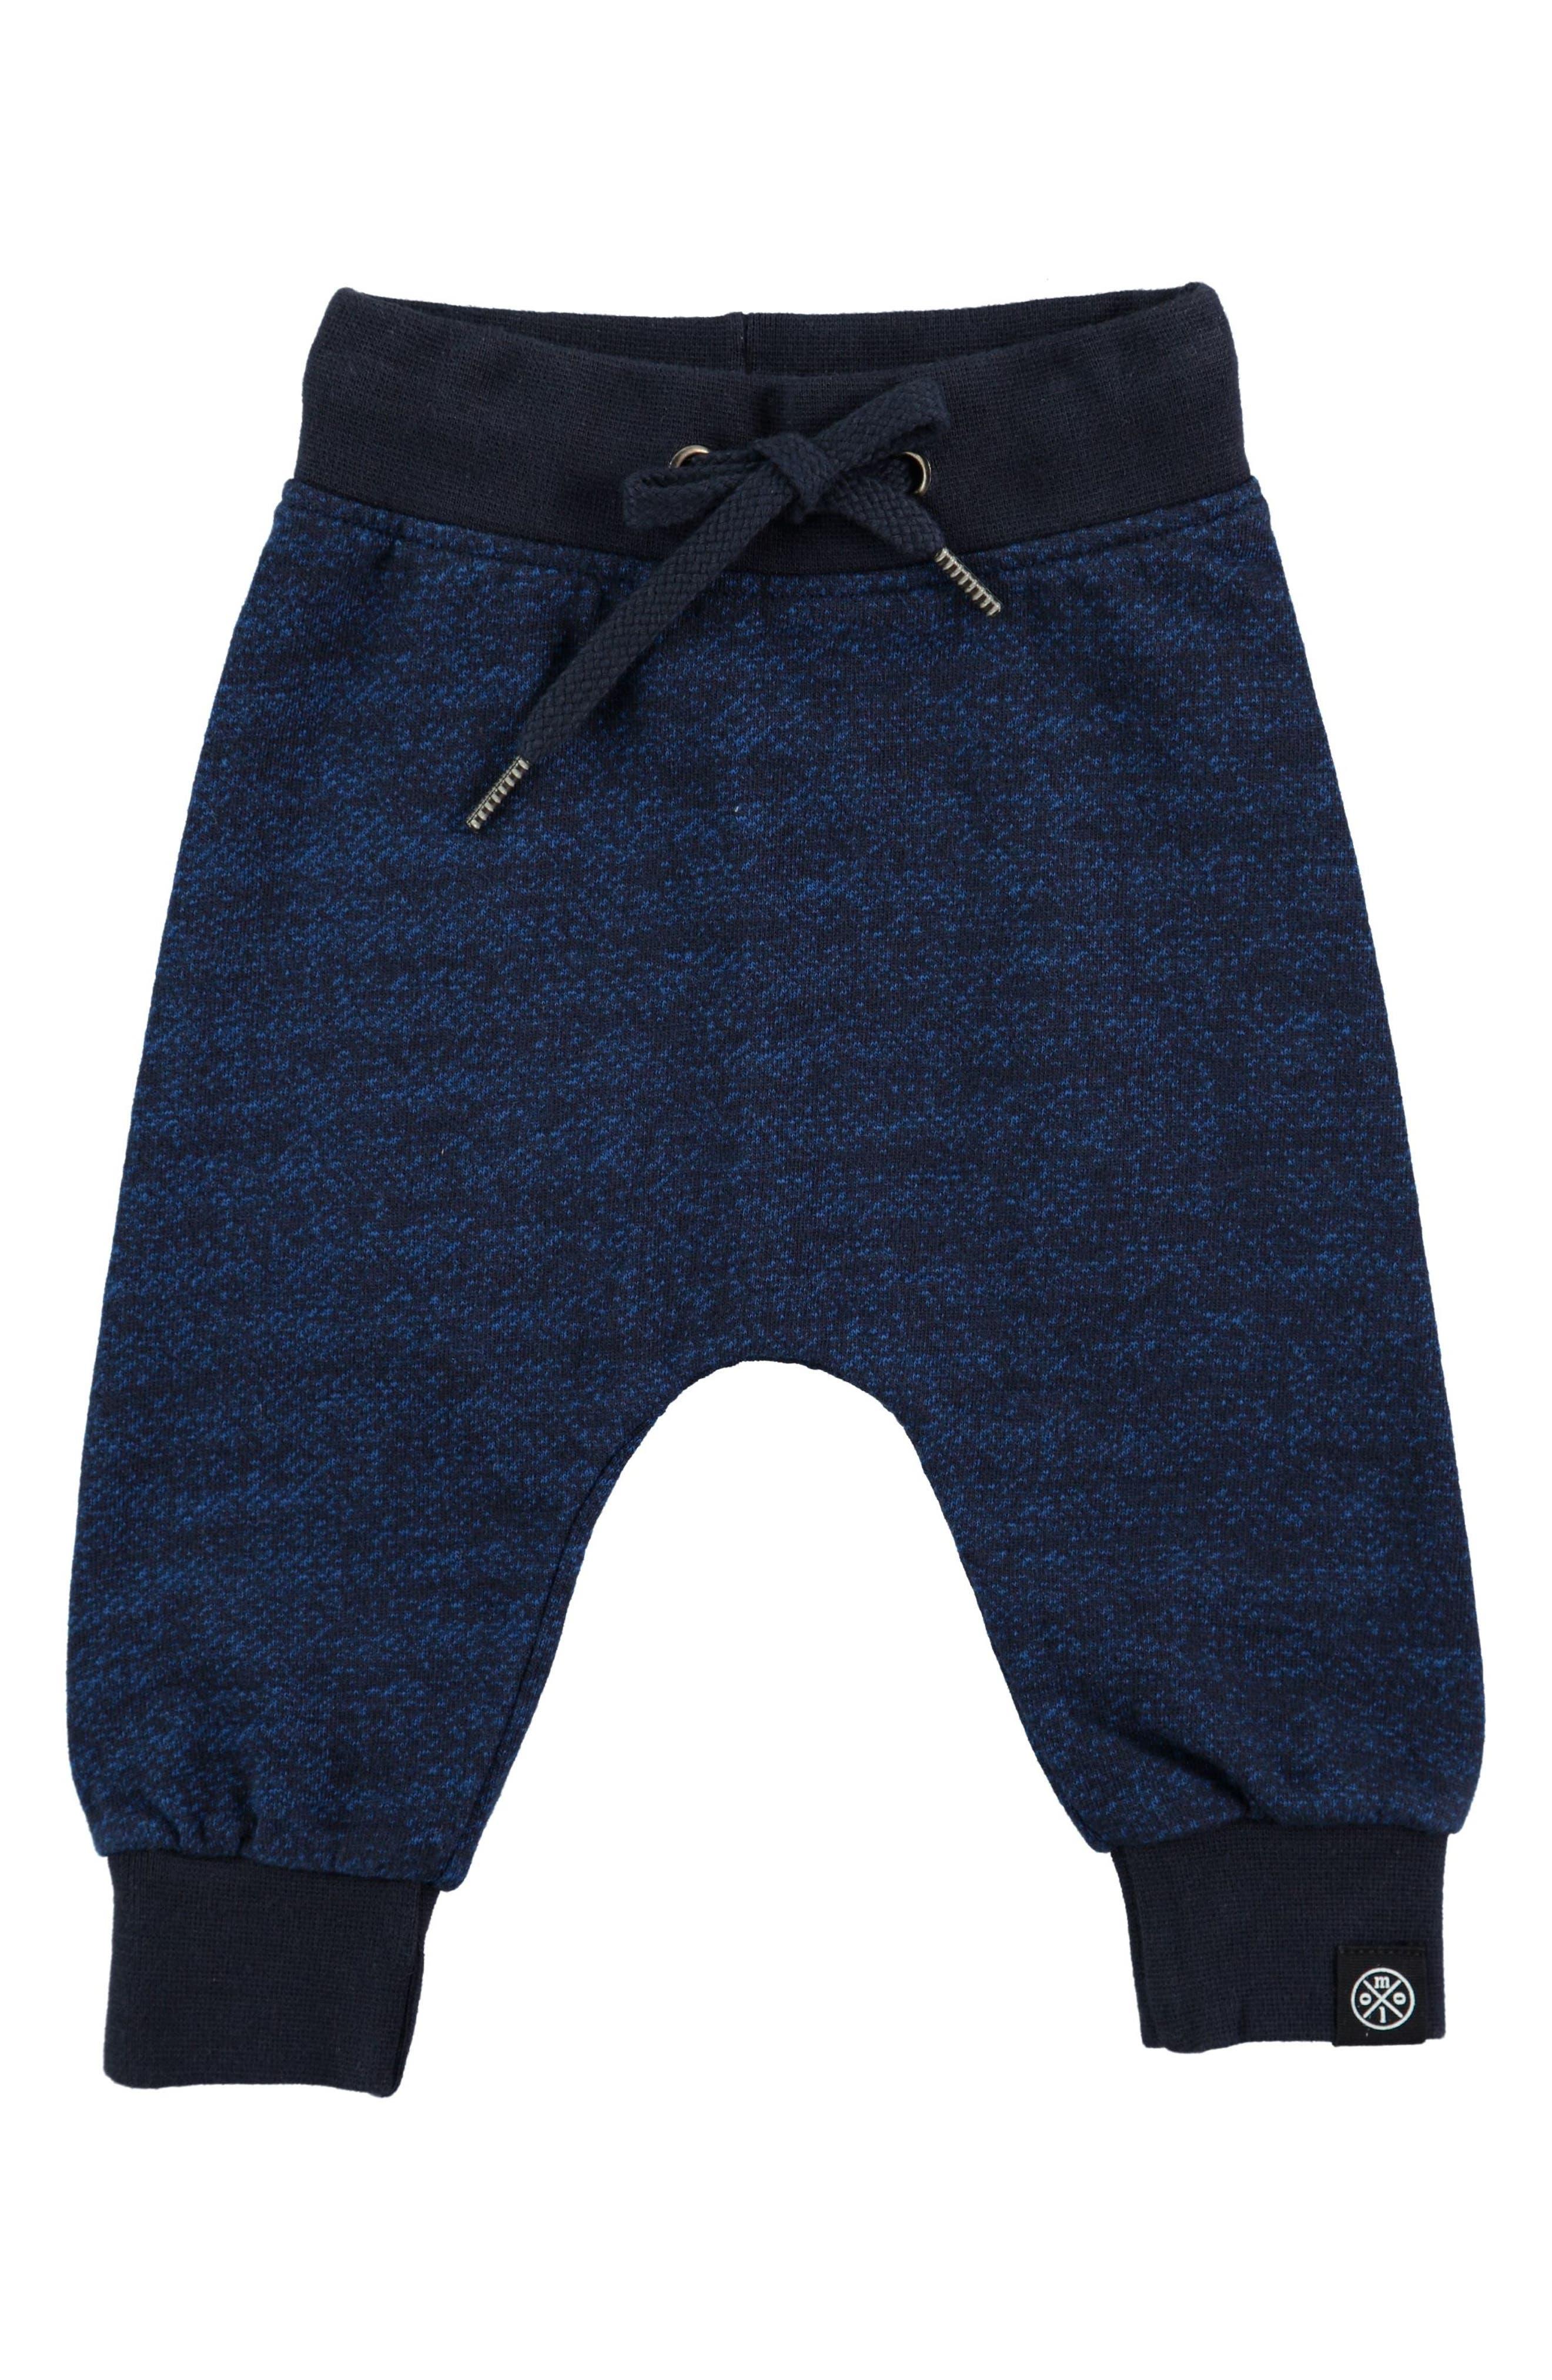 Sting Jogger Pants,                         Main,                         color, Navy Blazer